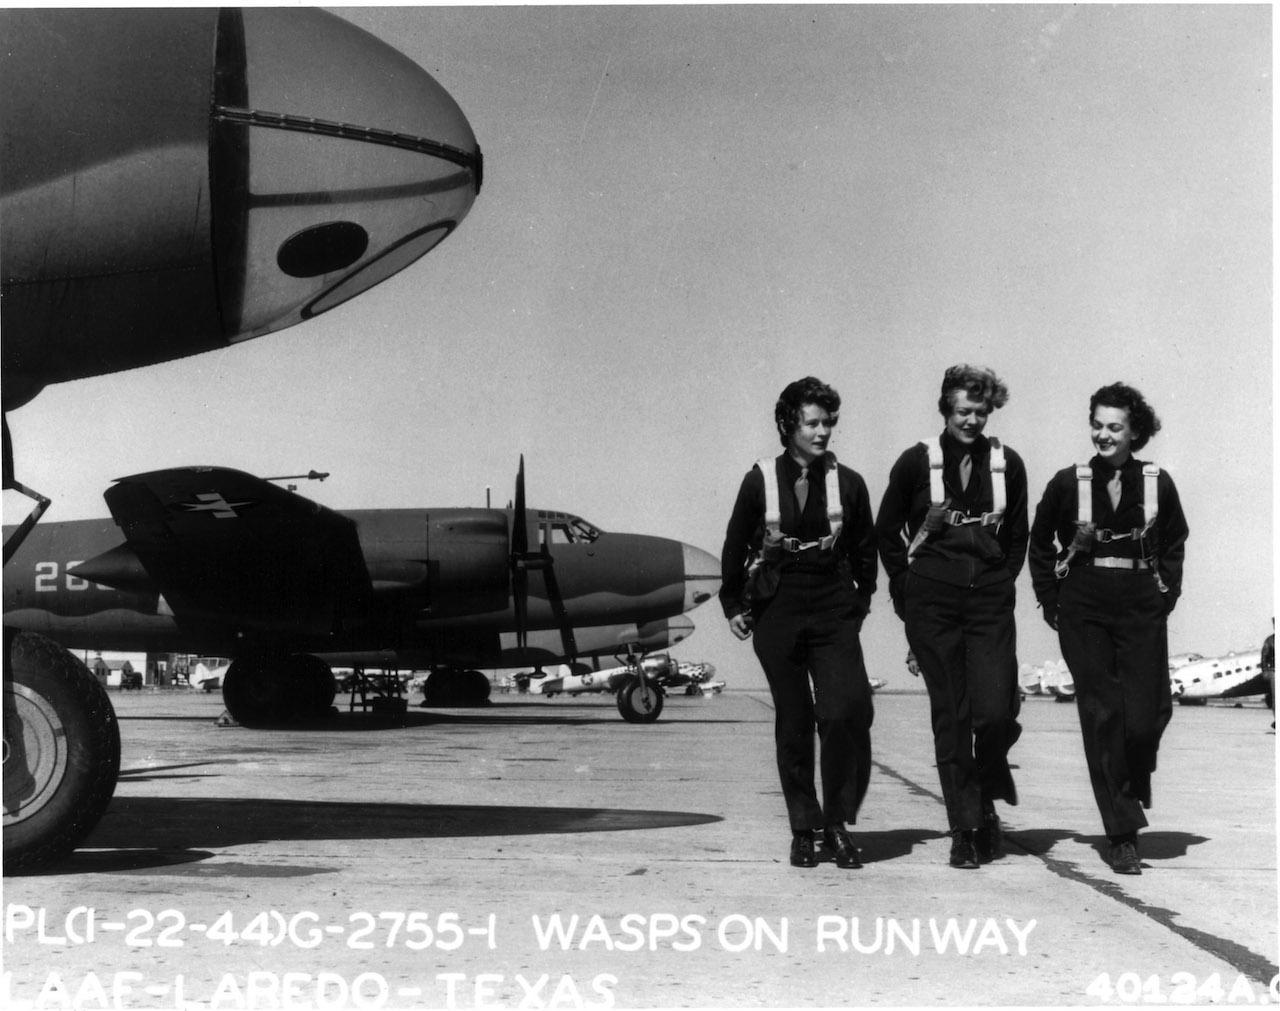 WASPs on flight line at Laredo AAF, Texas, 22 January 1944. (Courtesy: USAF)- Via Wikipedia